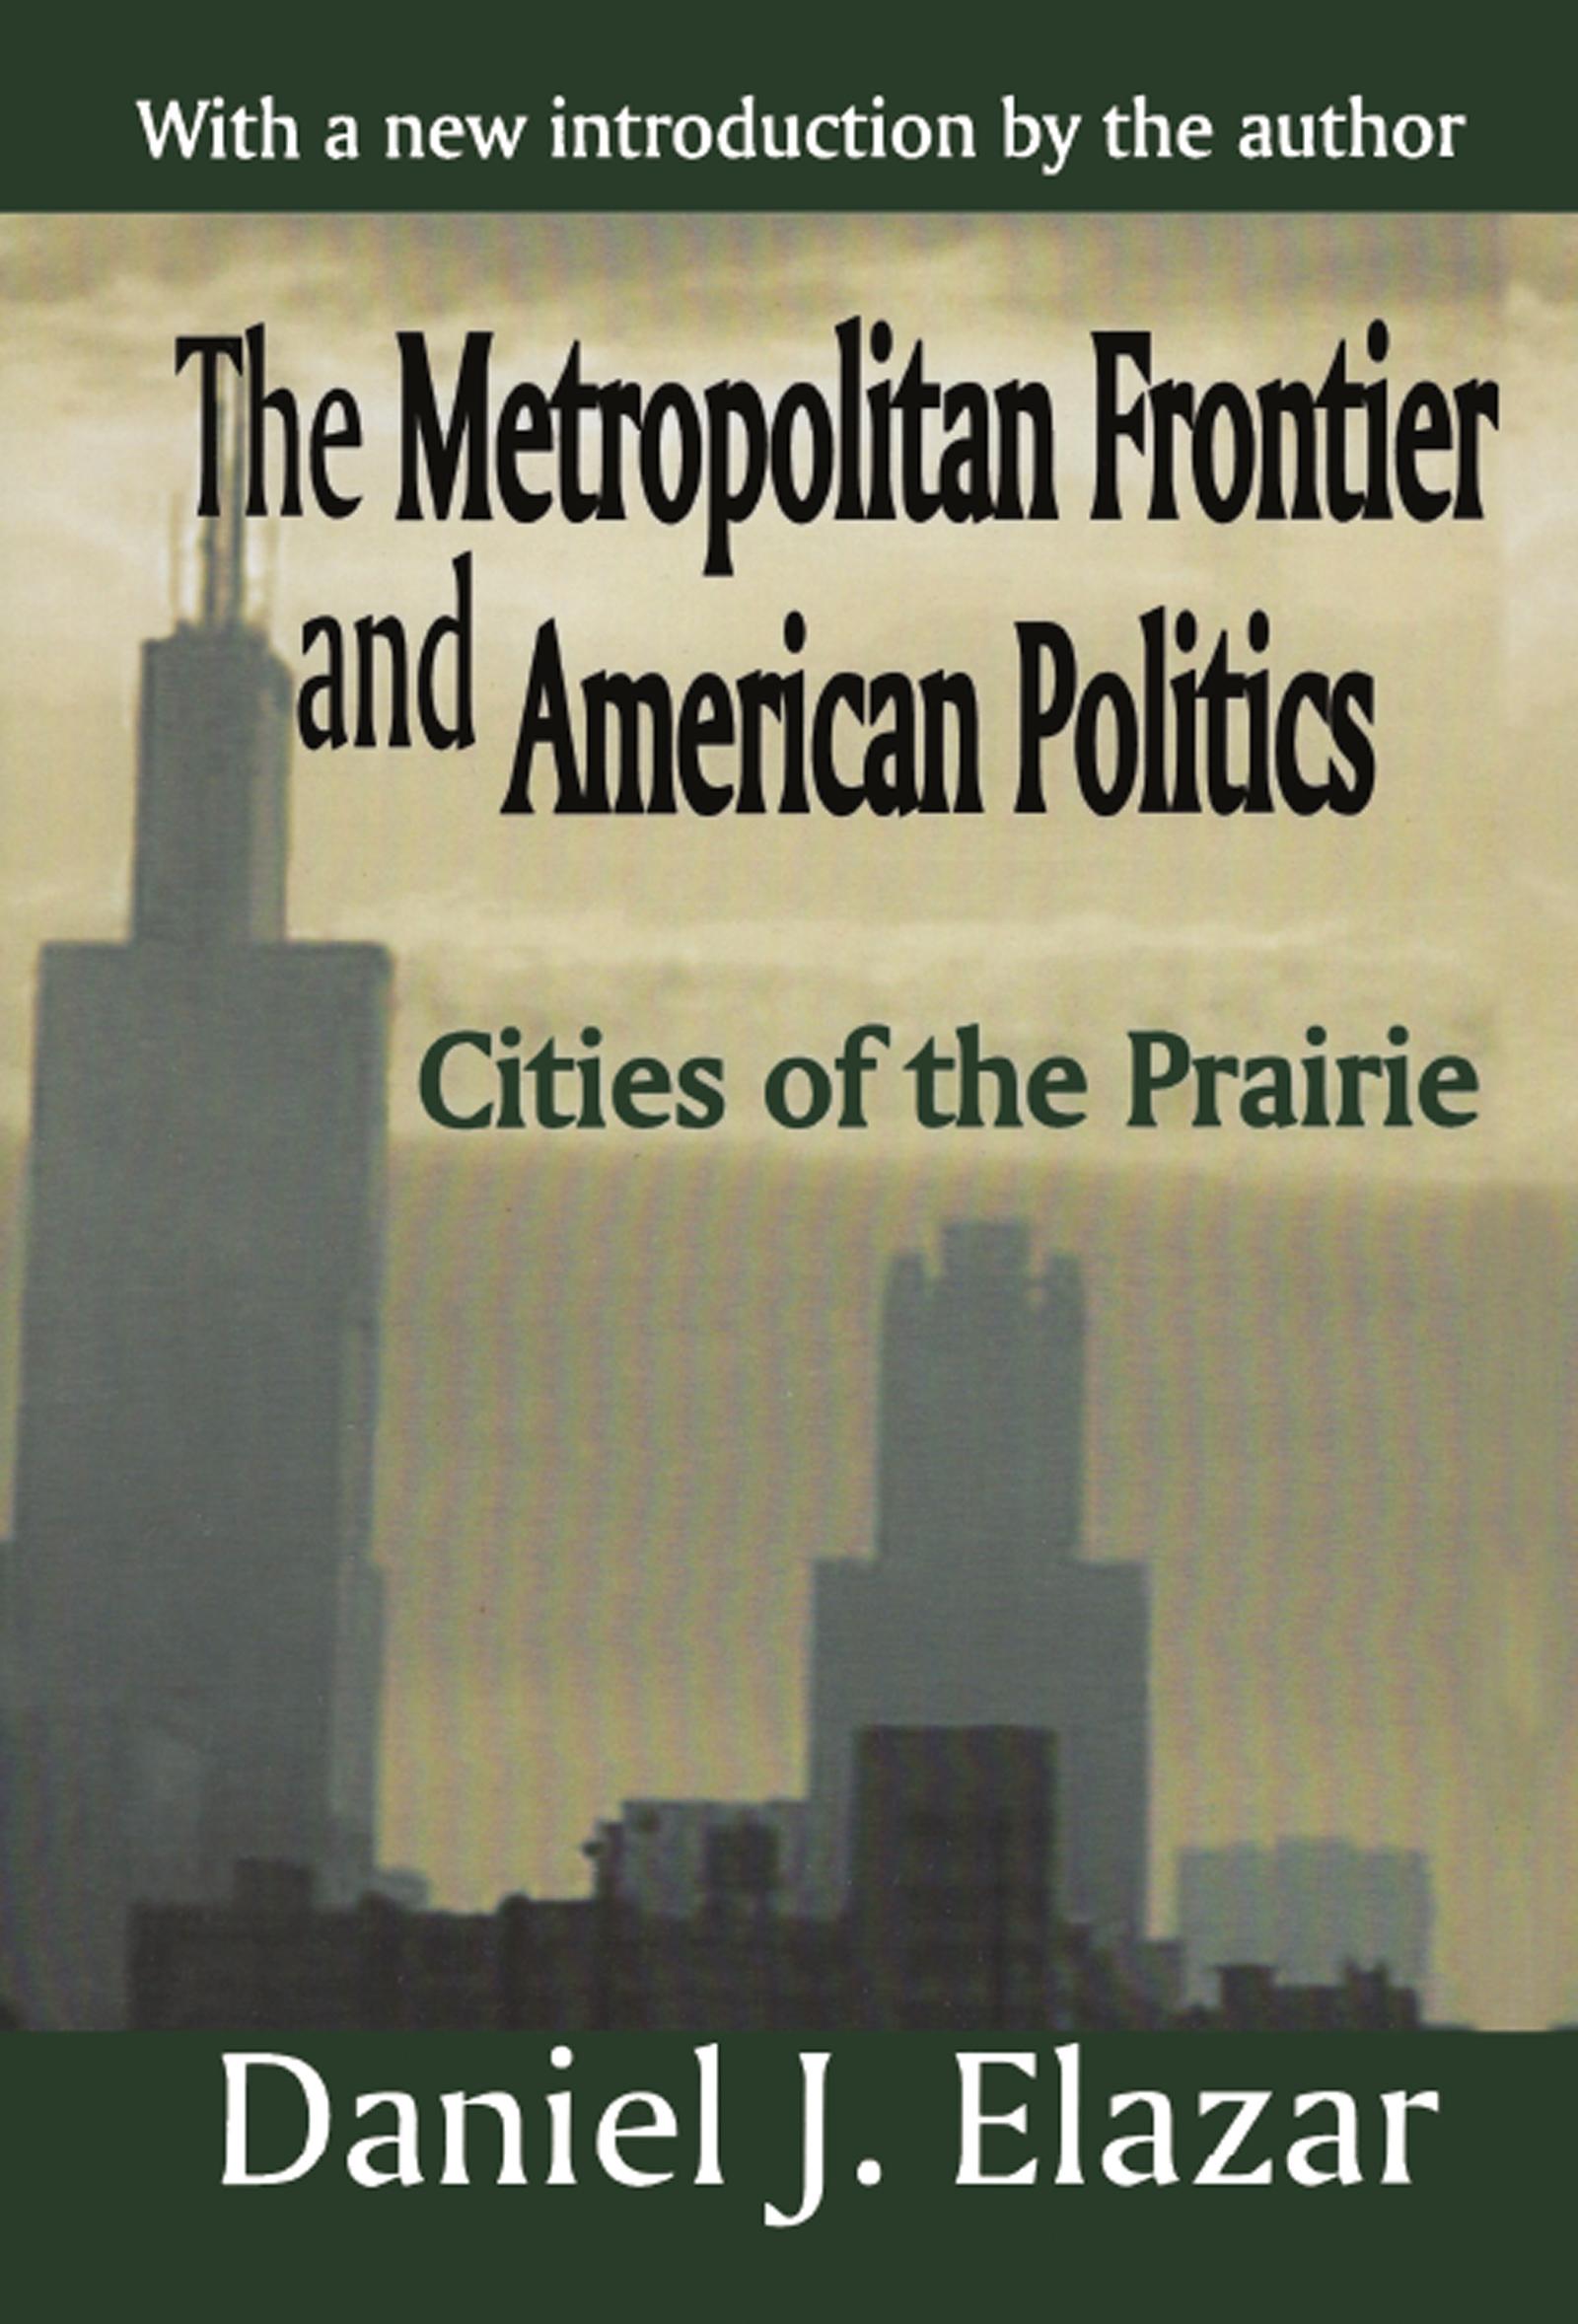 The Metropolitan Frontier and American Politics